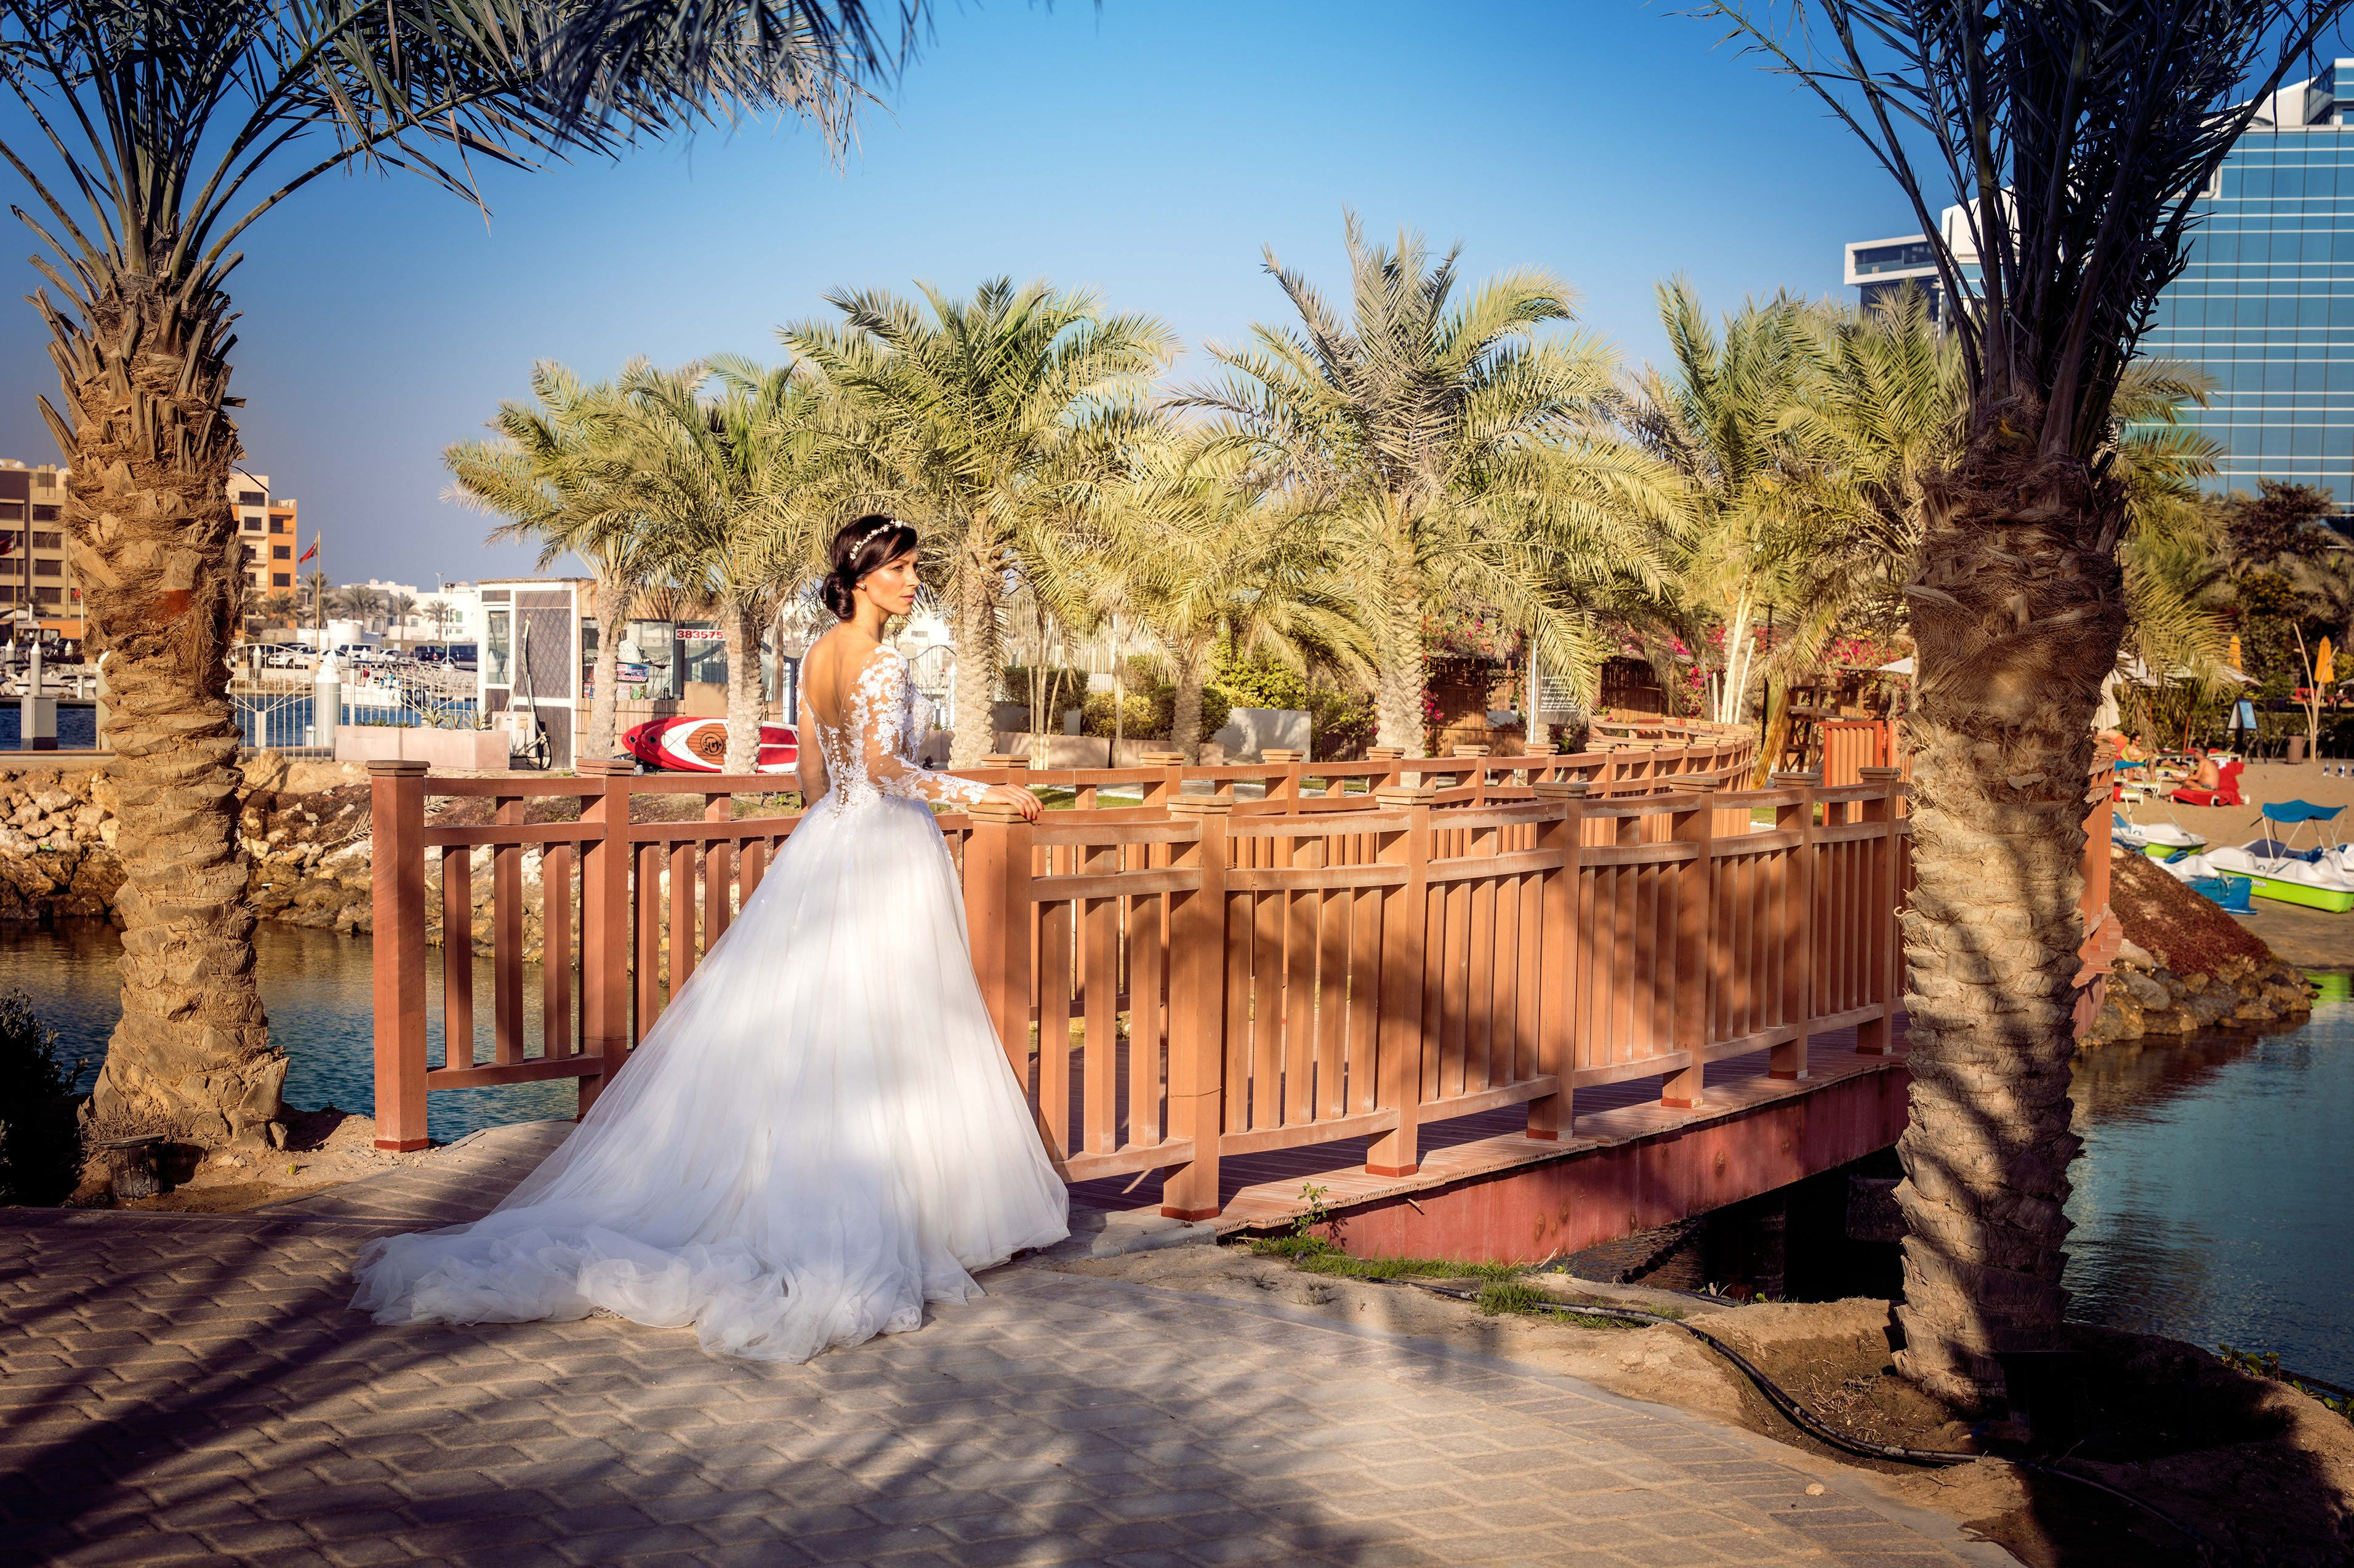 Wedding Nina Mommsen Photographer Bahrain Manama Professional Bride Dress Wedding Dresses Bride Wedding